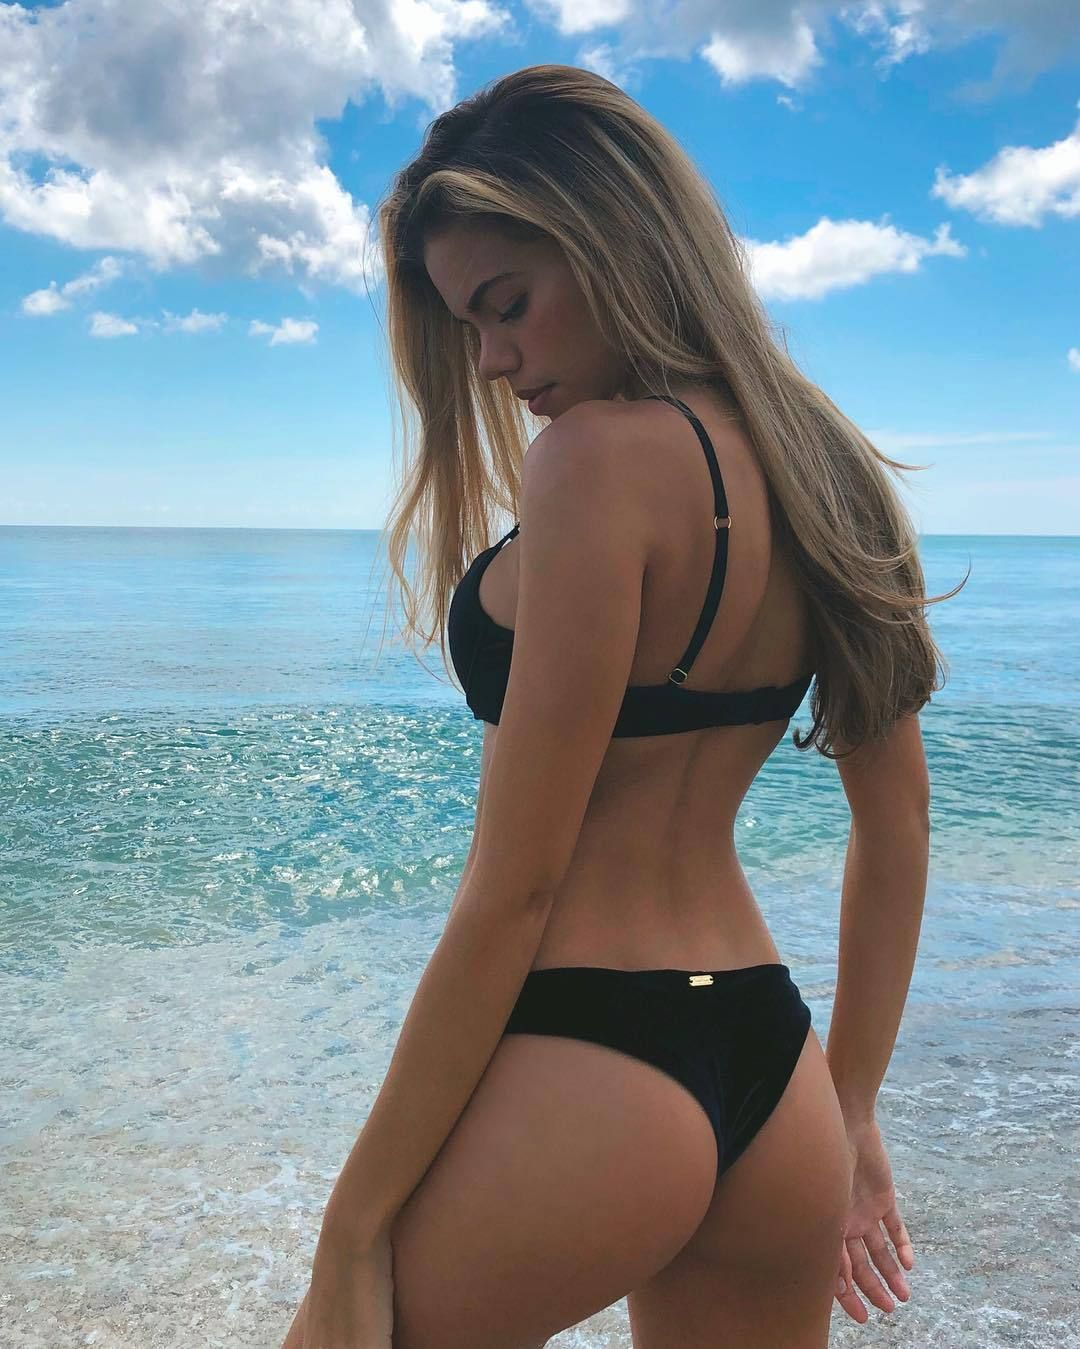 Hot girls bikini asses